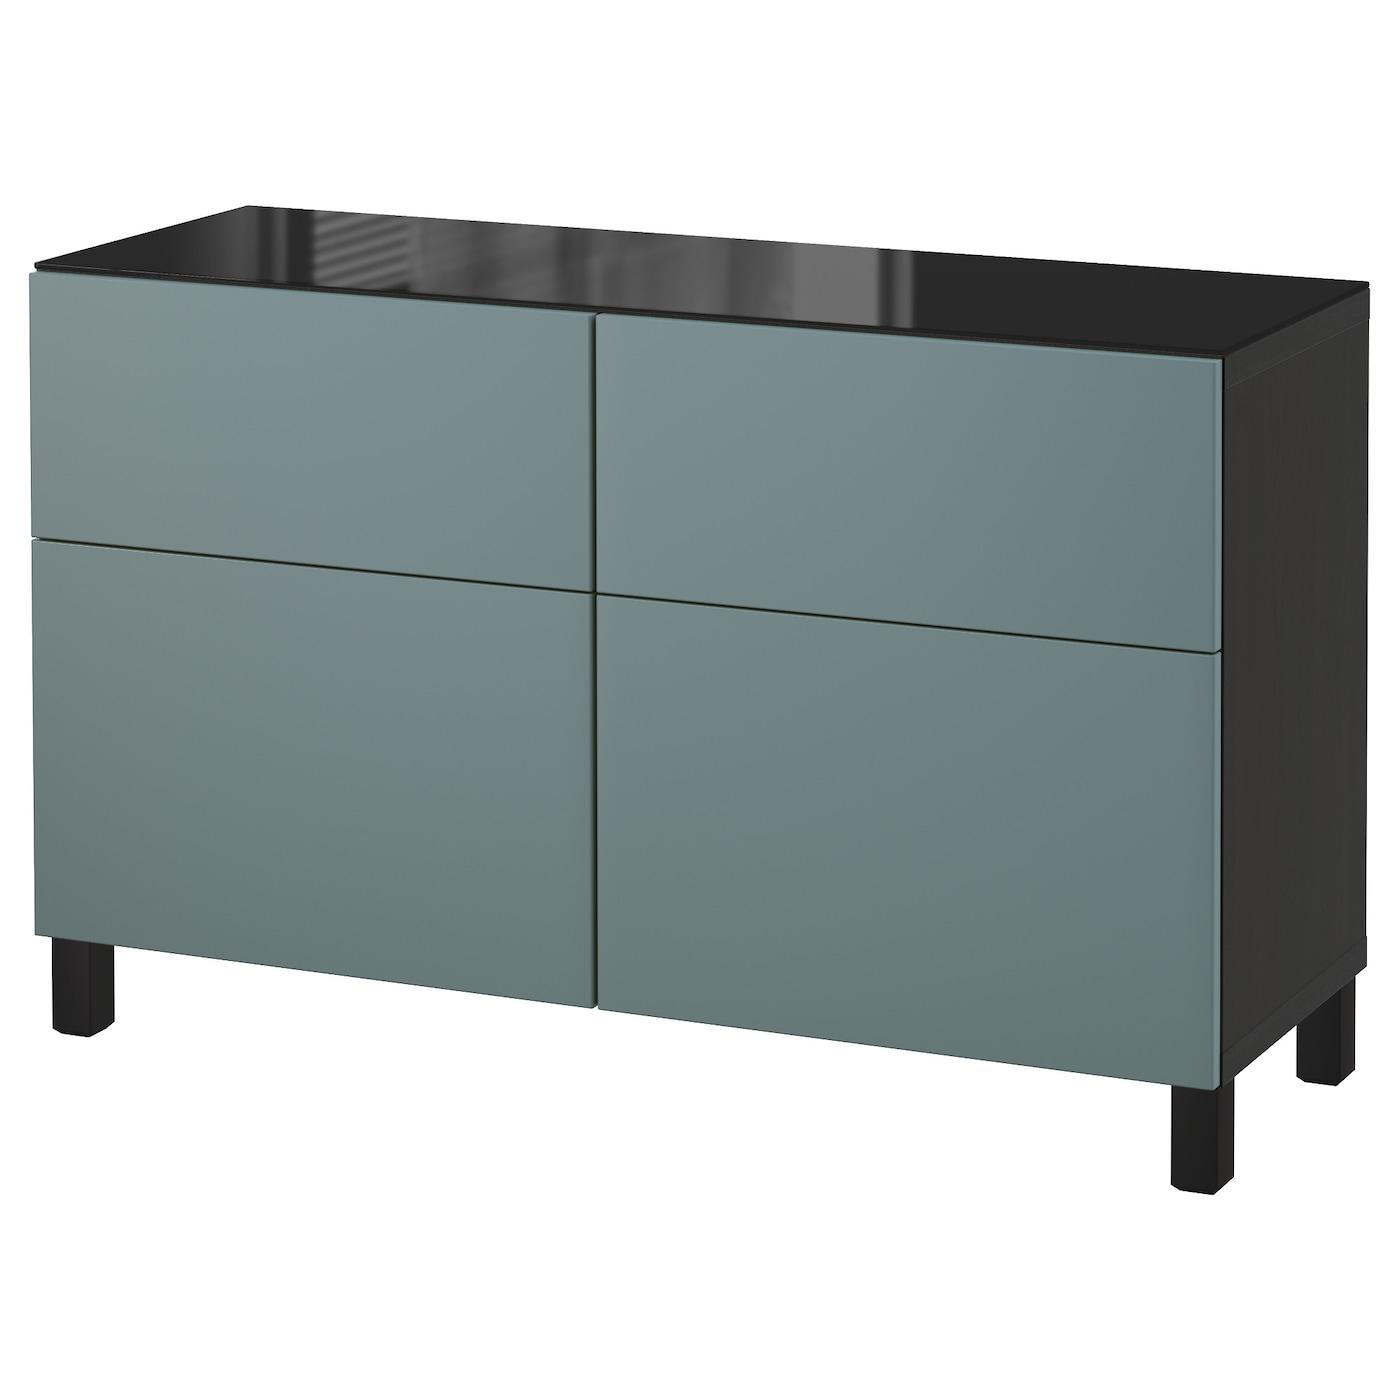 best combi rgt portes tiroirs brun noir valviken gris turquoise 120x40x74 cm ikea. Black Bedroom Furniture Sets. Home Design Ideas